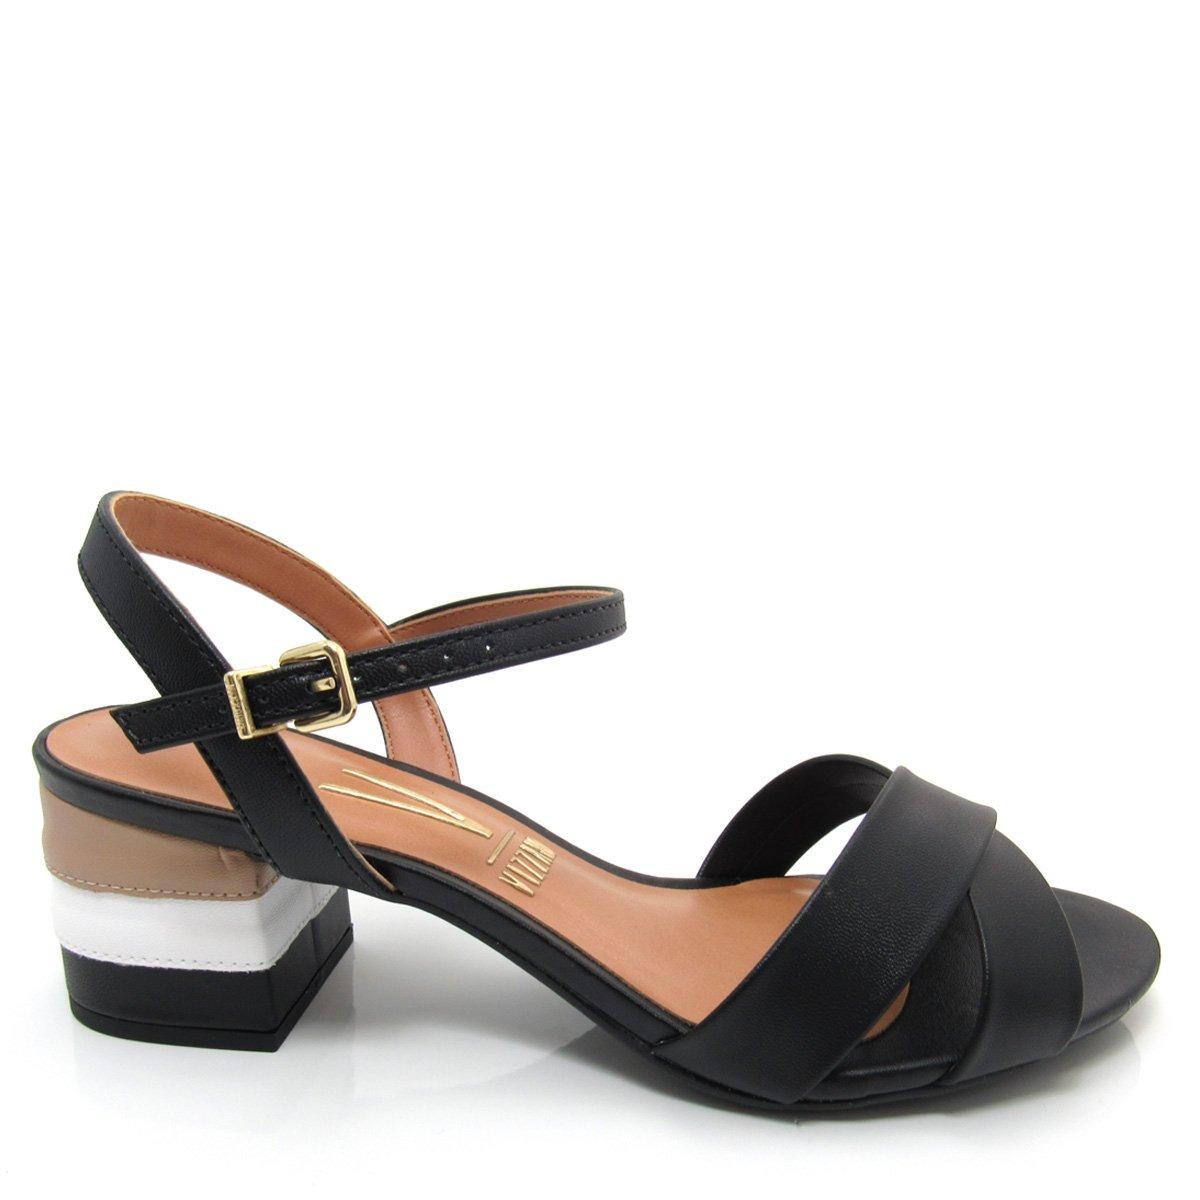 0c7afba025 sandália vizzano 6291327 feminina salto baixo e grosso. Carregando zoom.